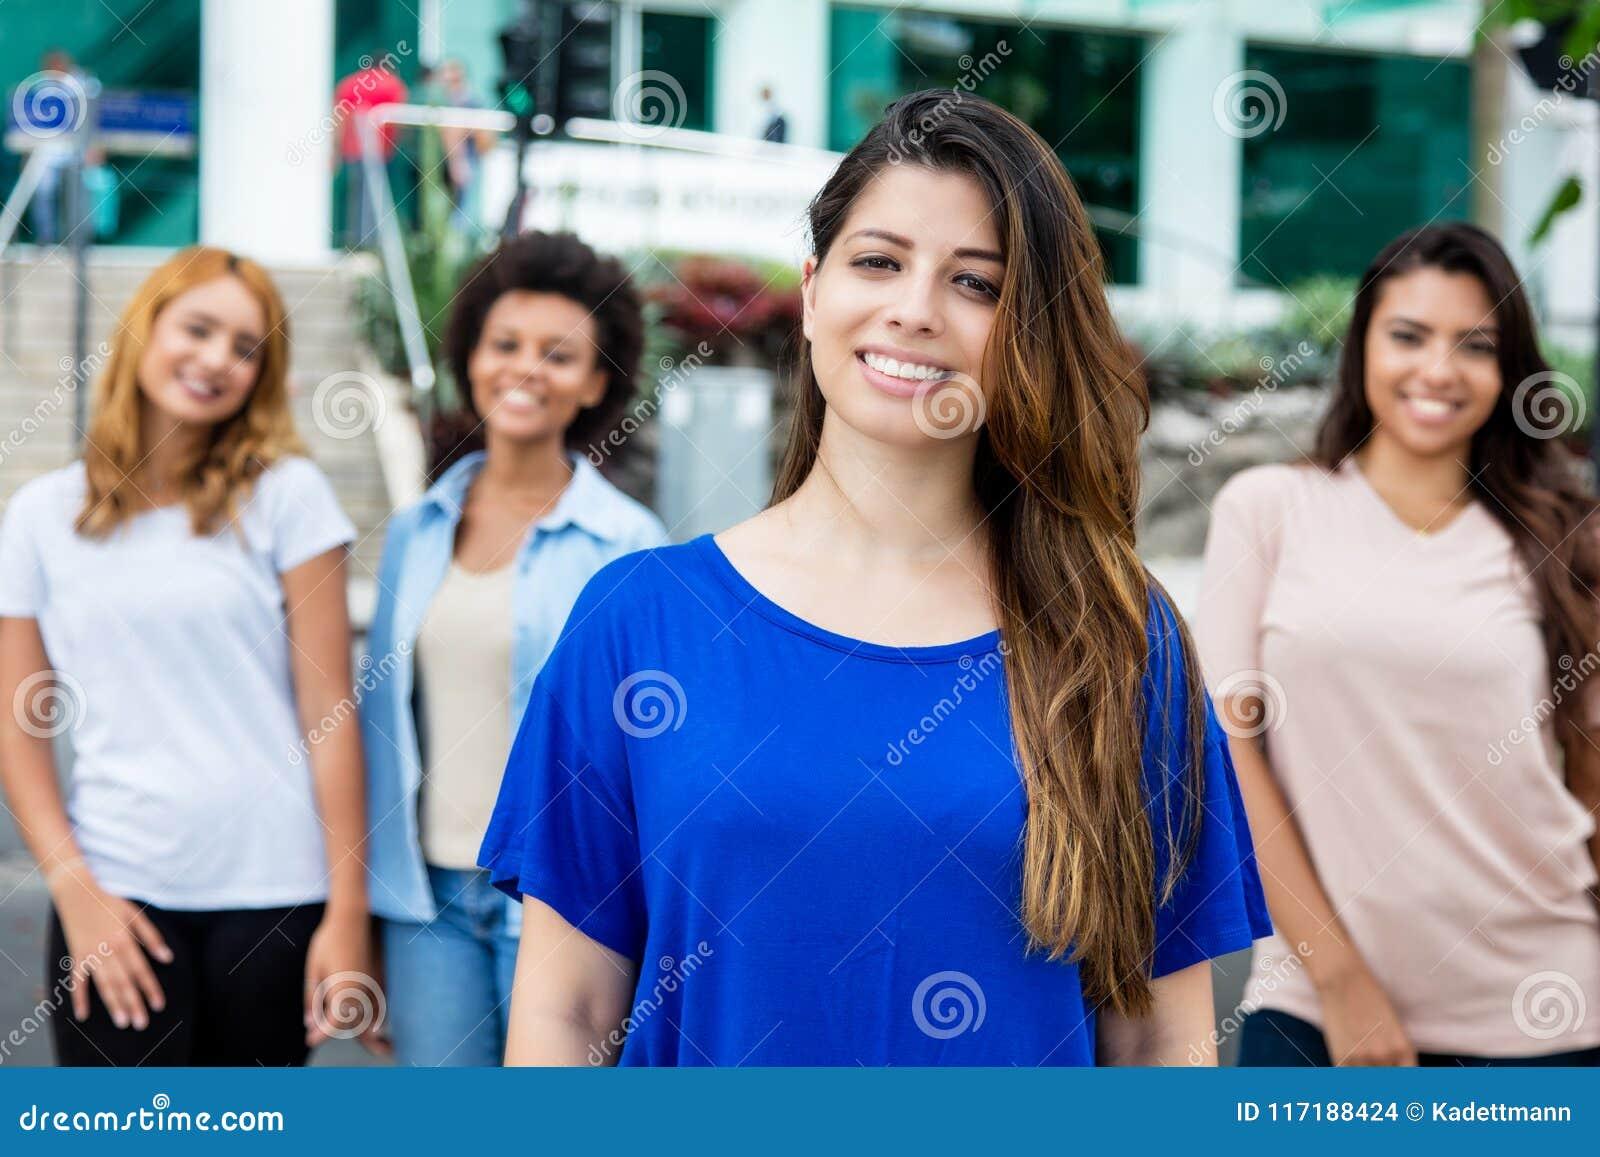 Donna ispana con Latino e ragazze ispanice ed africane